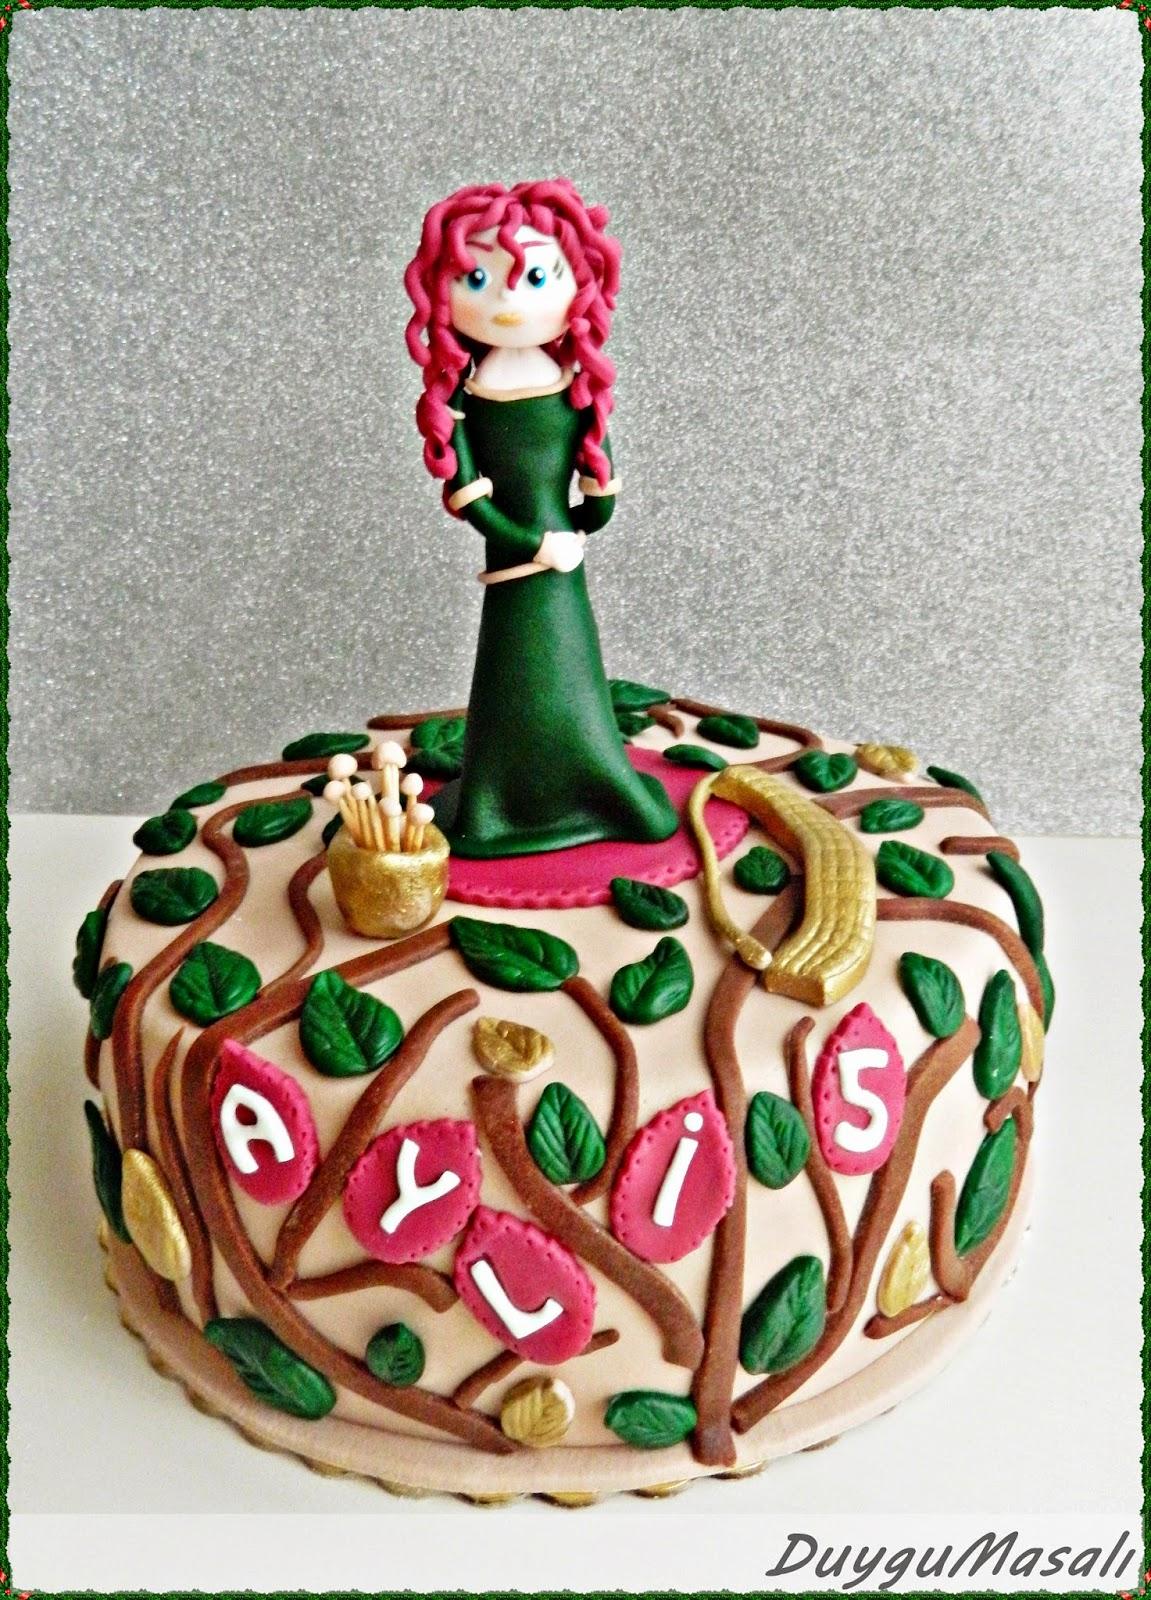 edirne prenses merida butik pasta